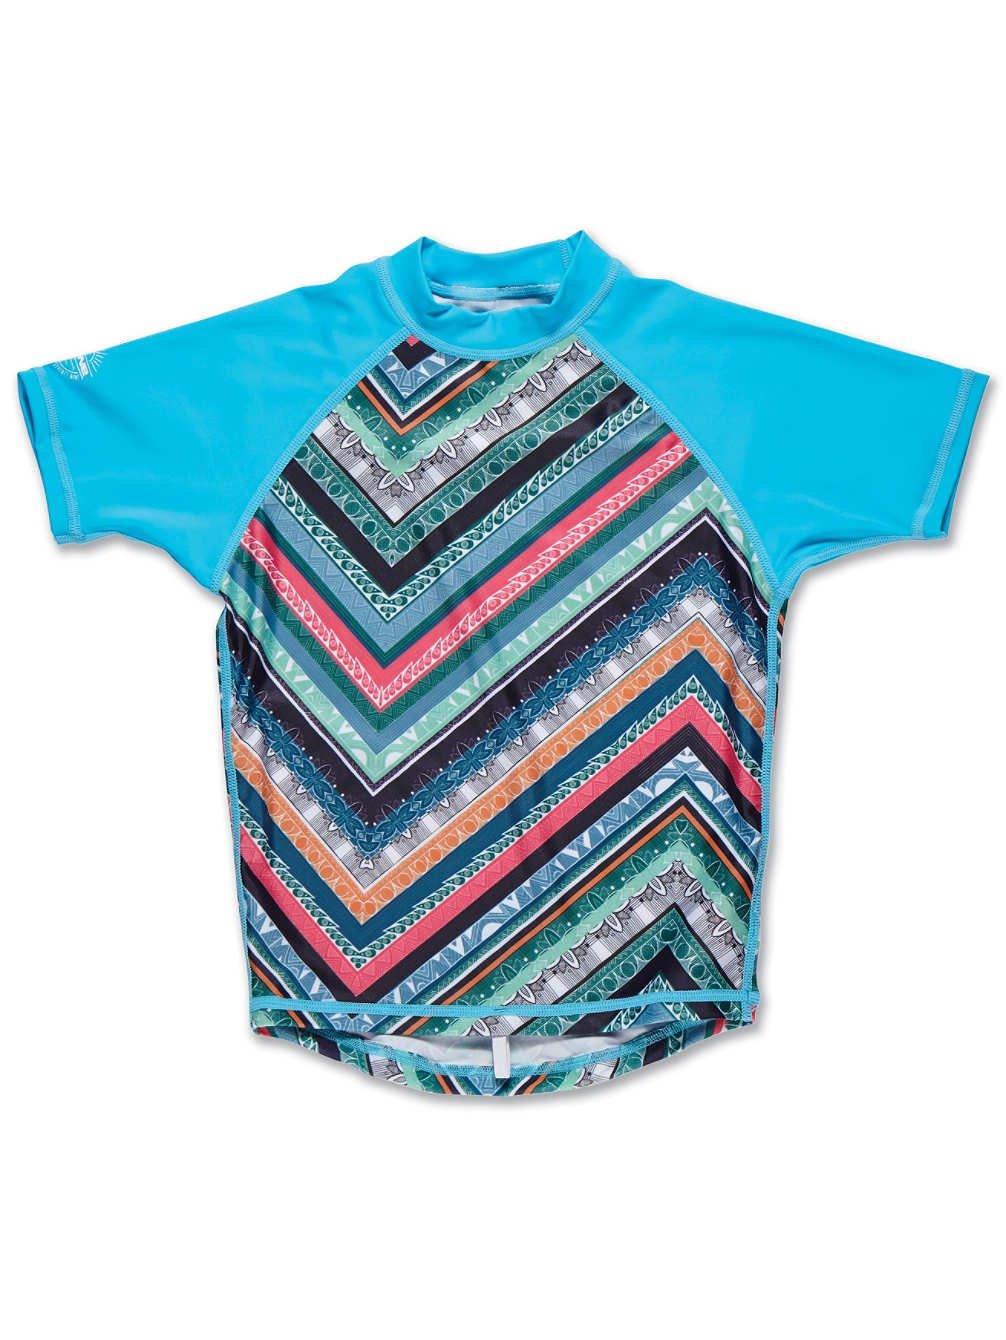 Dakine Girl's Classic Short Sleeve Rashguard Shirt, Native Isle, 8